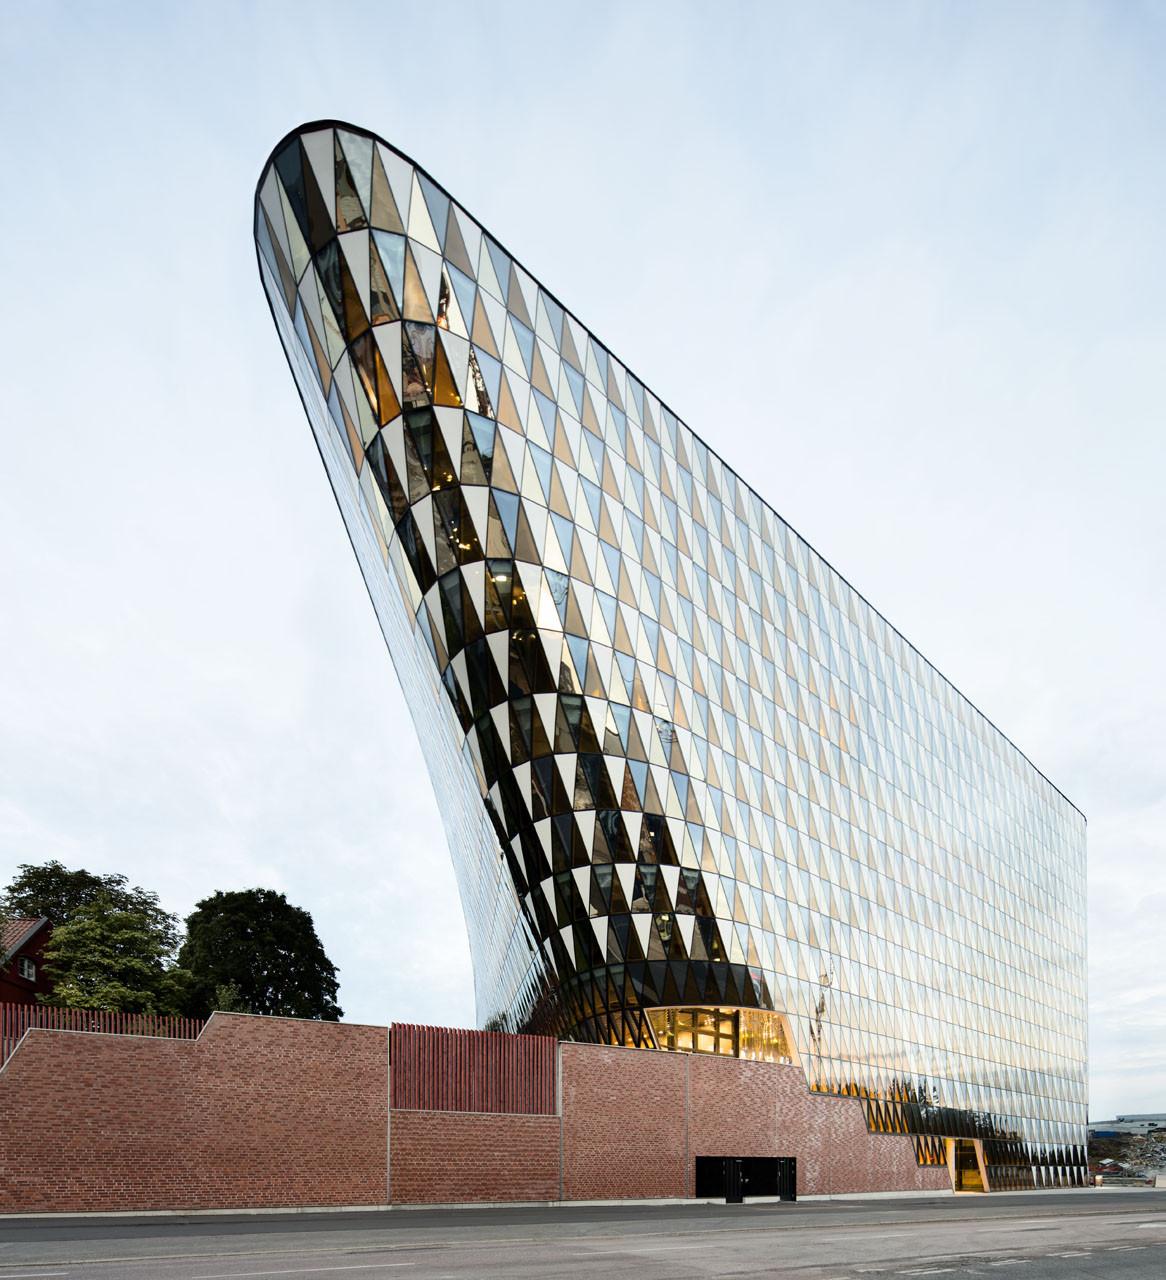 Aula m dica wing rdhs plataforma arquitectura for Aulas web arquitectura